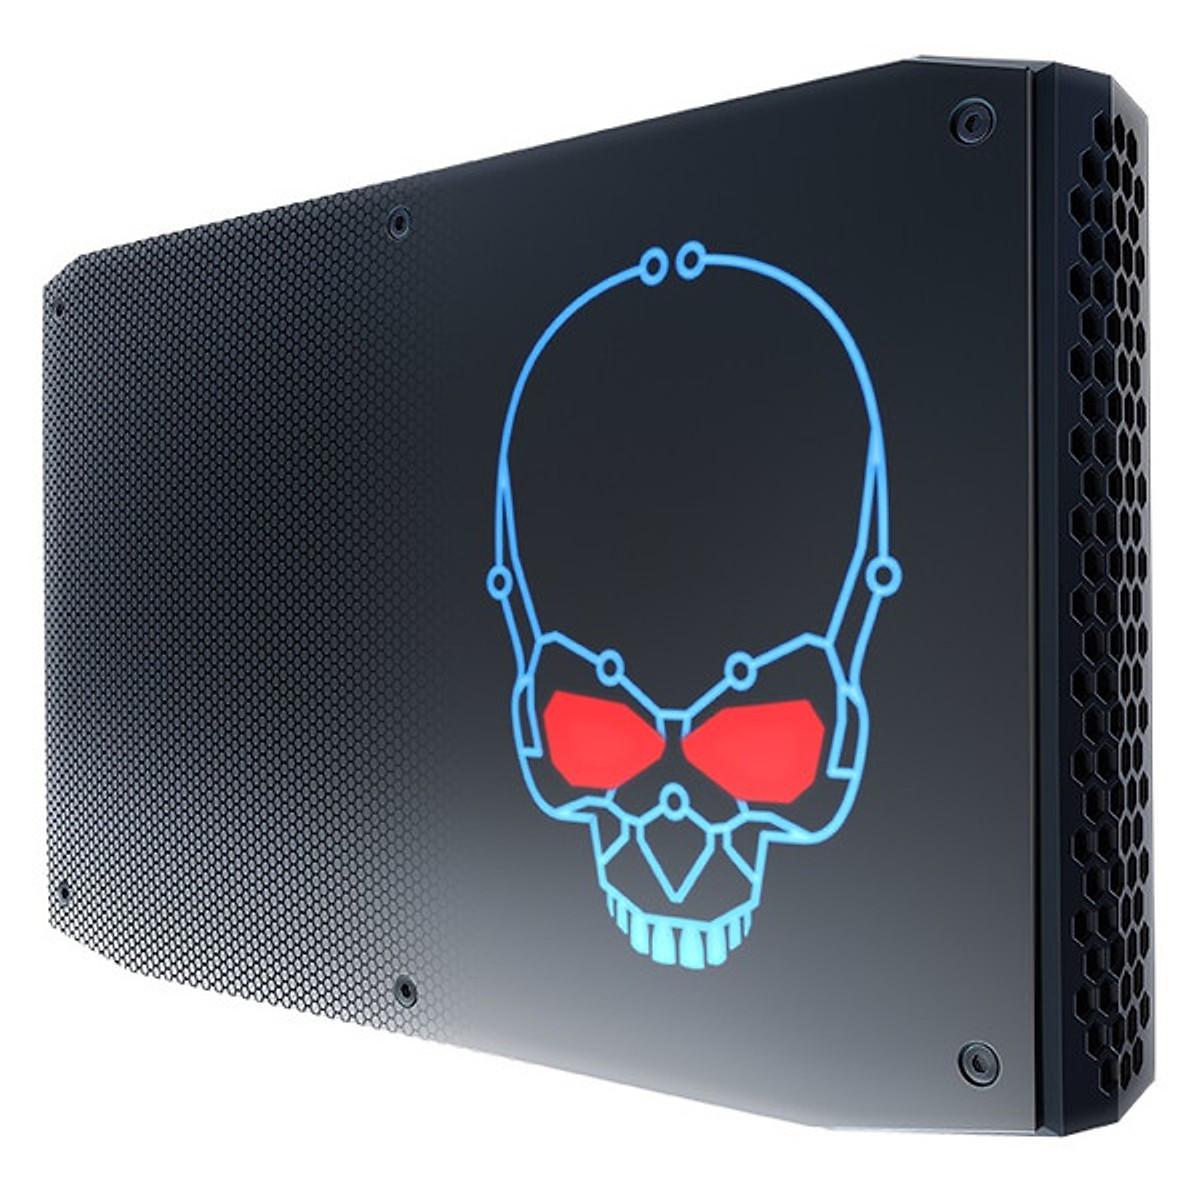 Máy tính bộ PC Intel NUC Kit BOXNUC8I7HVK2 ( Intel Core™ i7-8089G/  Radeon™ RX Vega M GH graphics )